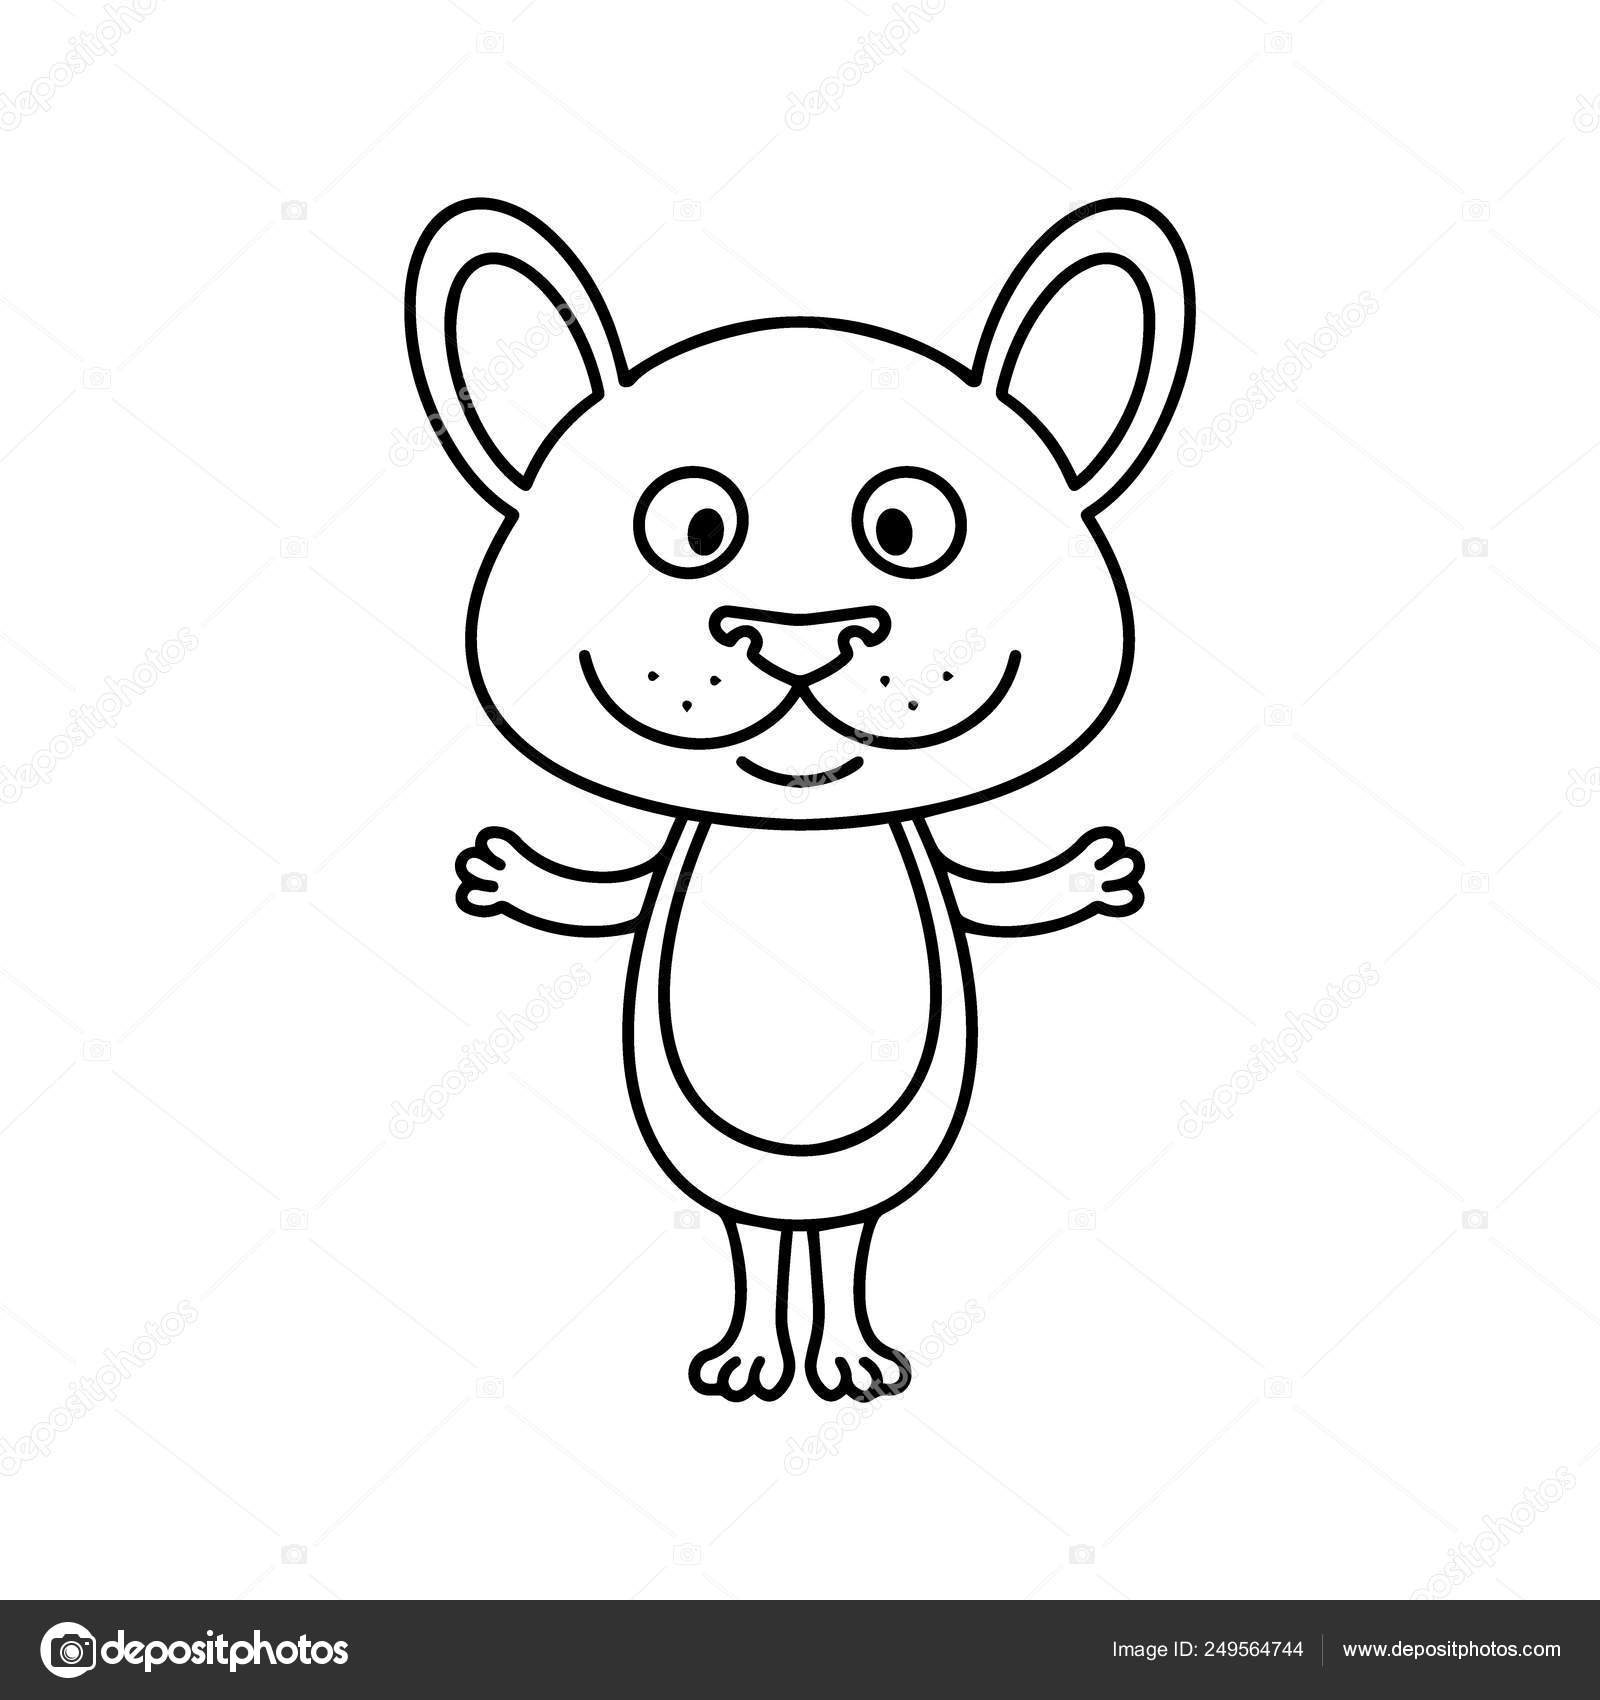 Cute Mouse Cartoon Linear Art Animal Sketch Vector Illustration